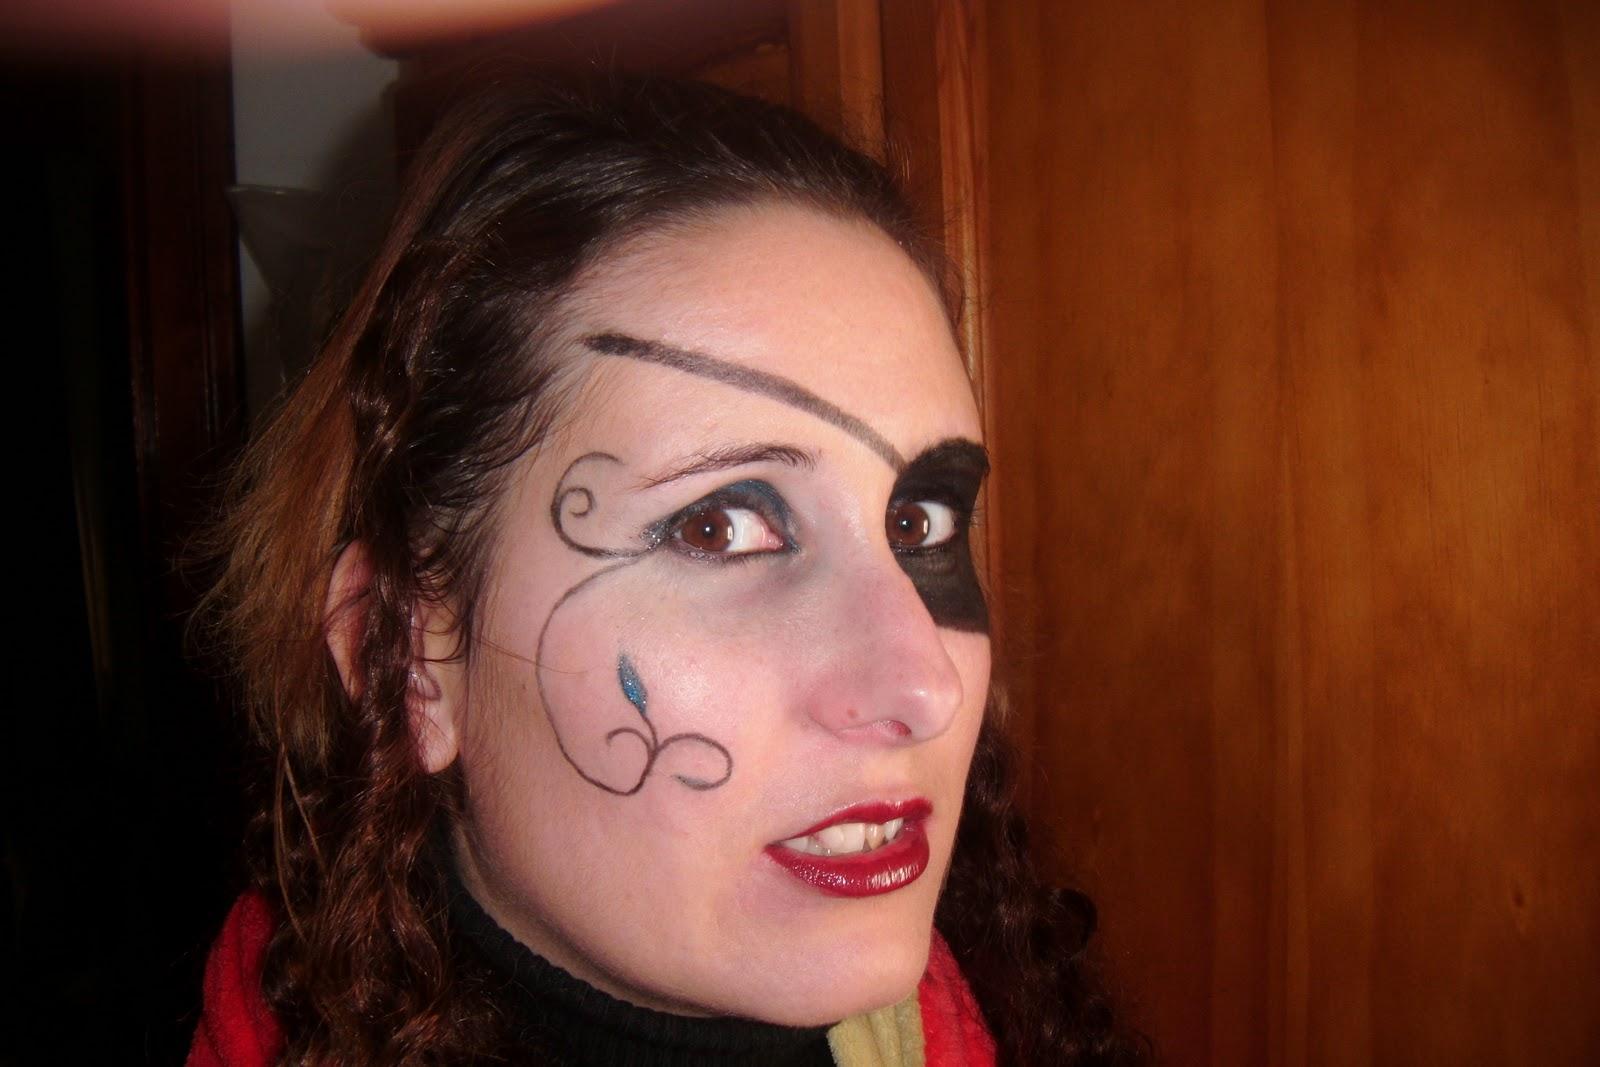 Maquillaje pirata mujer parche - Maquillaje pirata nina ...